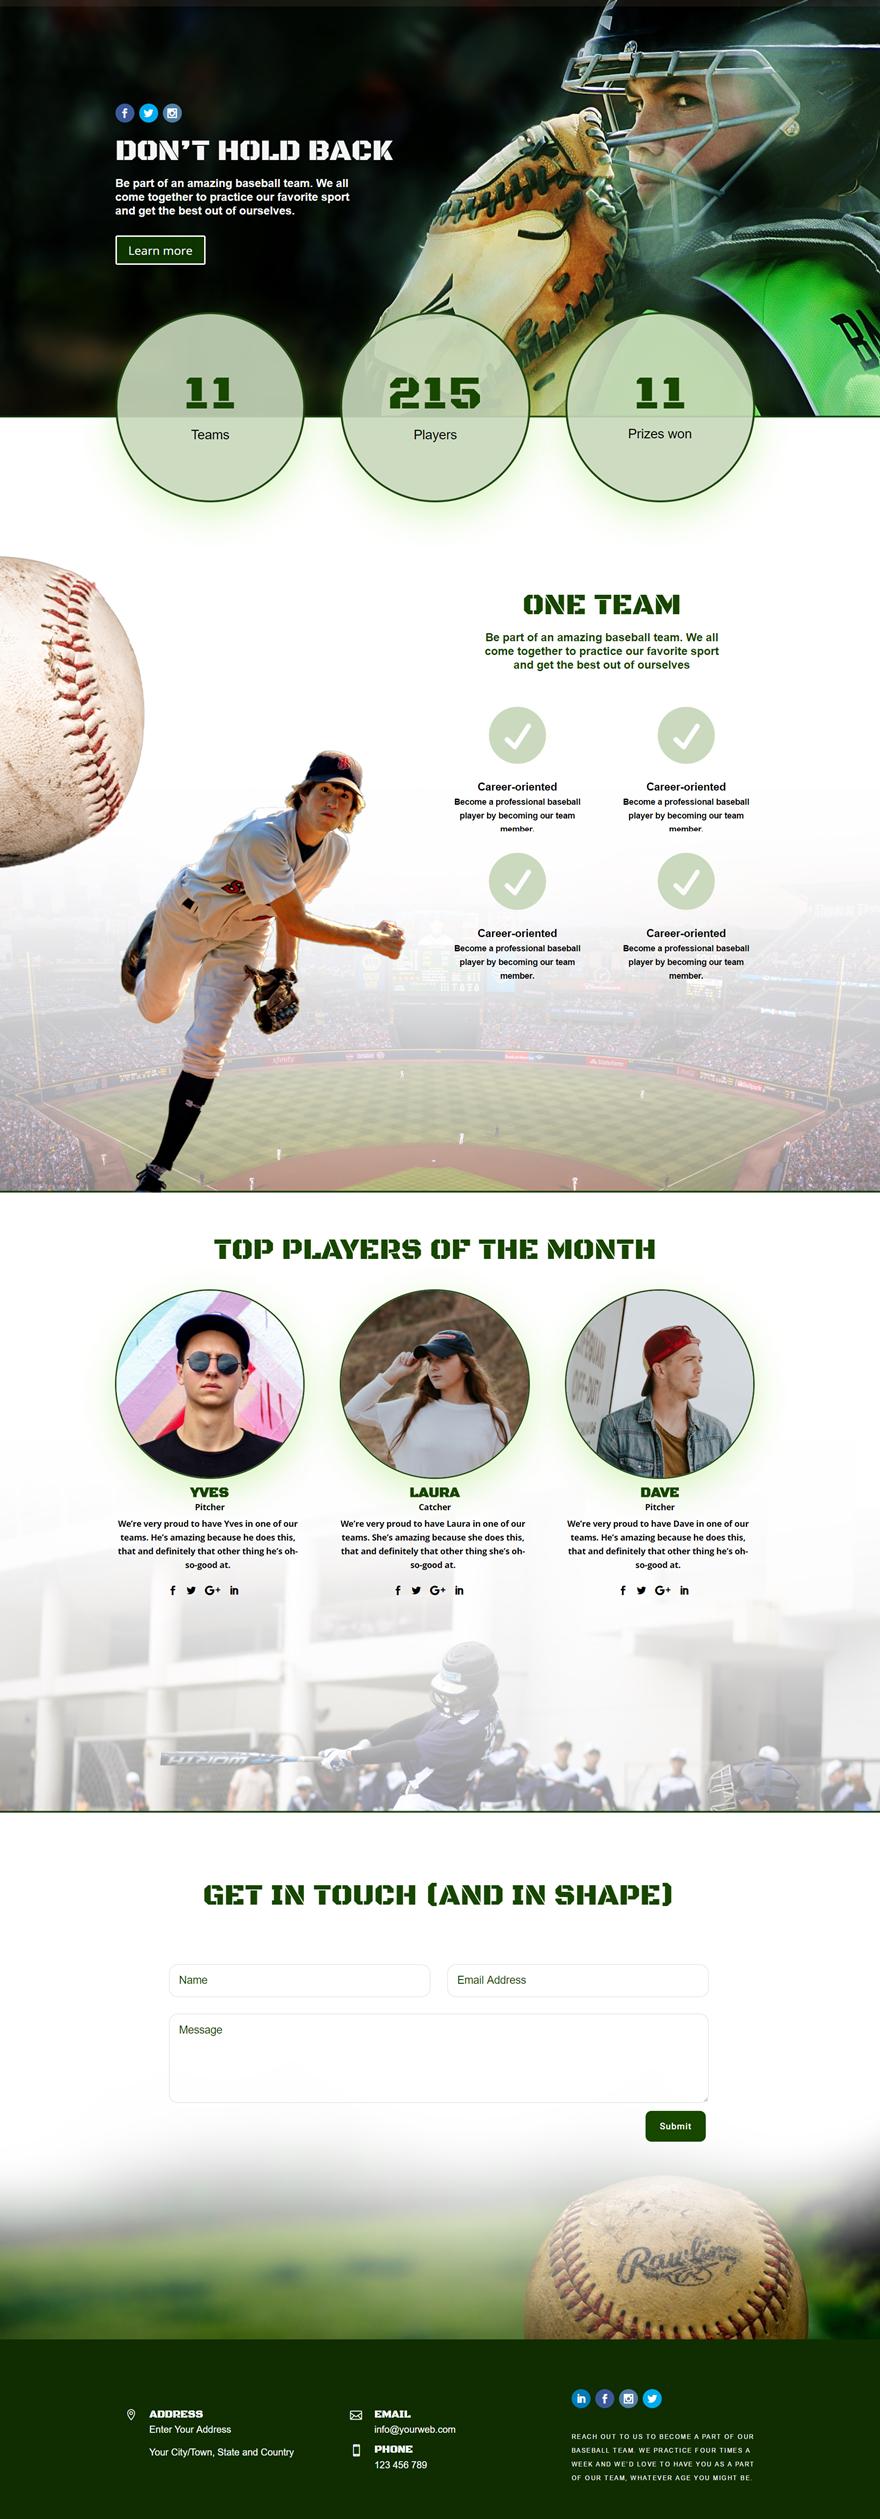 baseball-divi-layout-telechargement